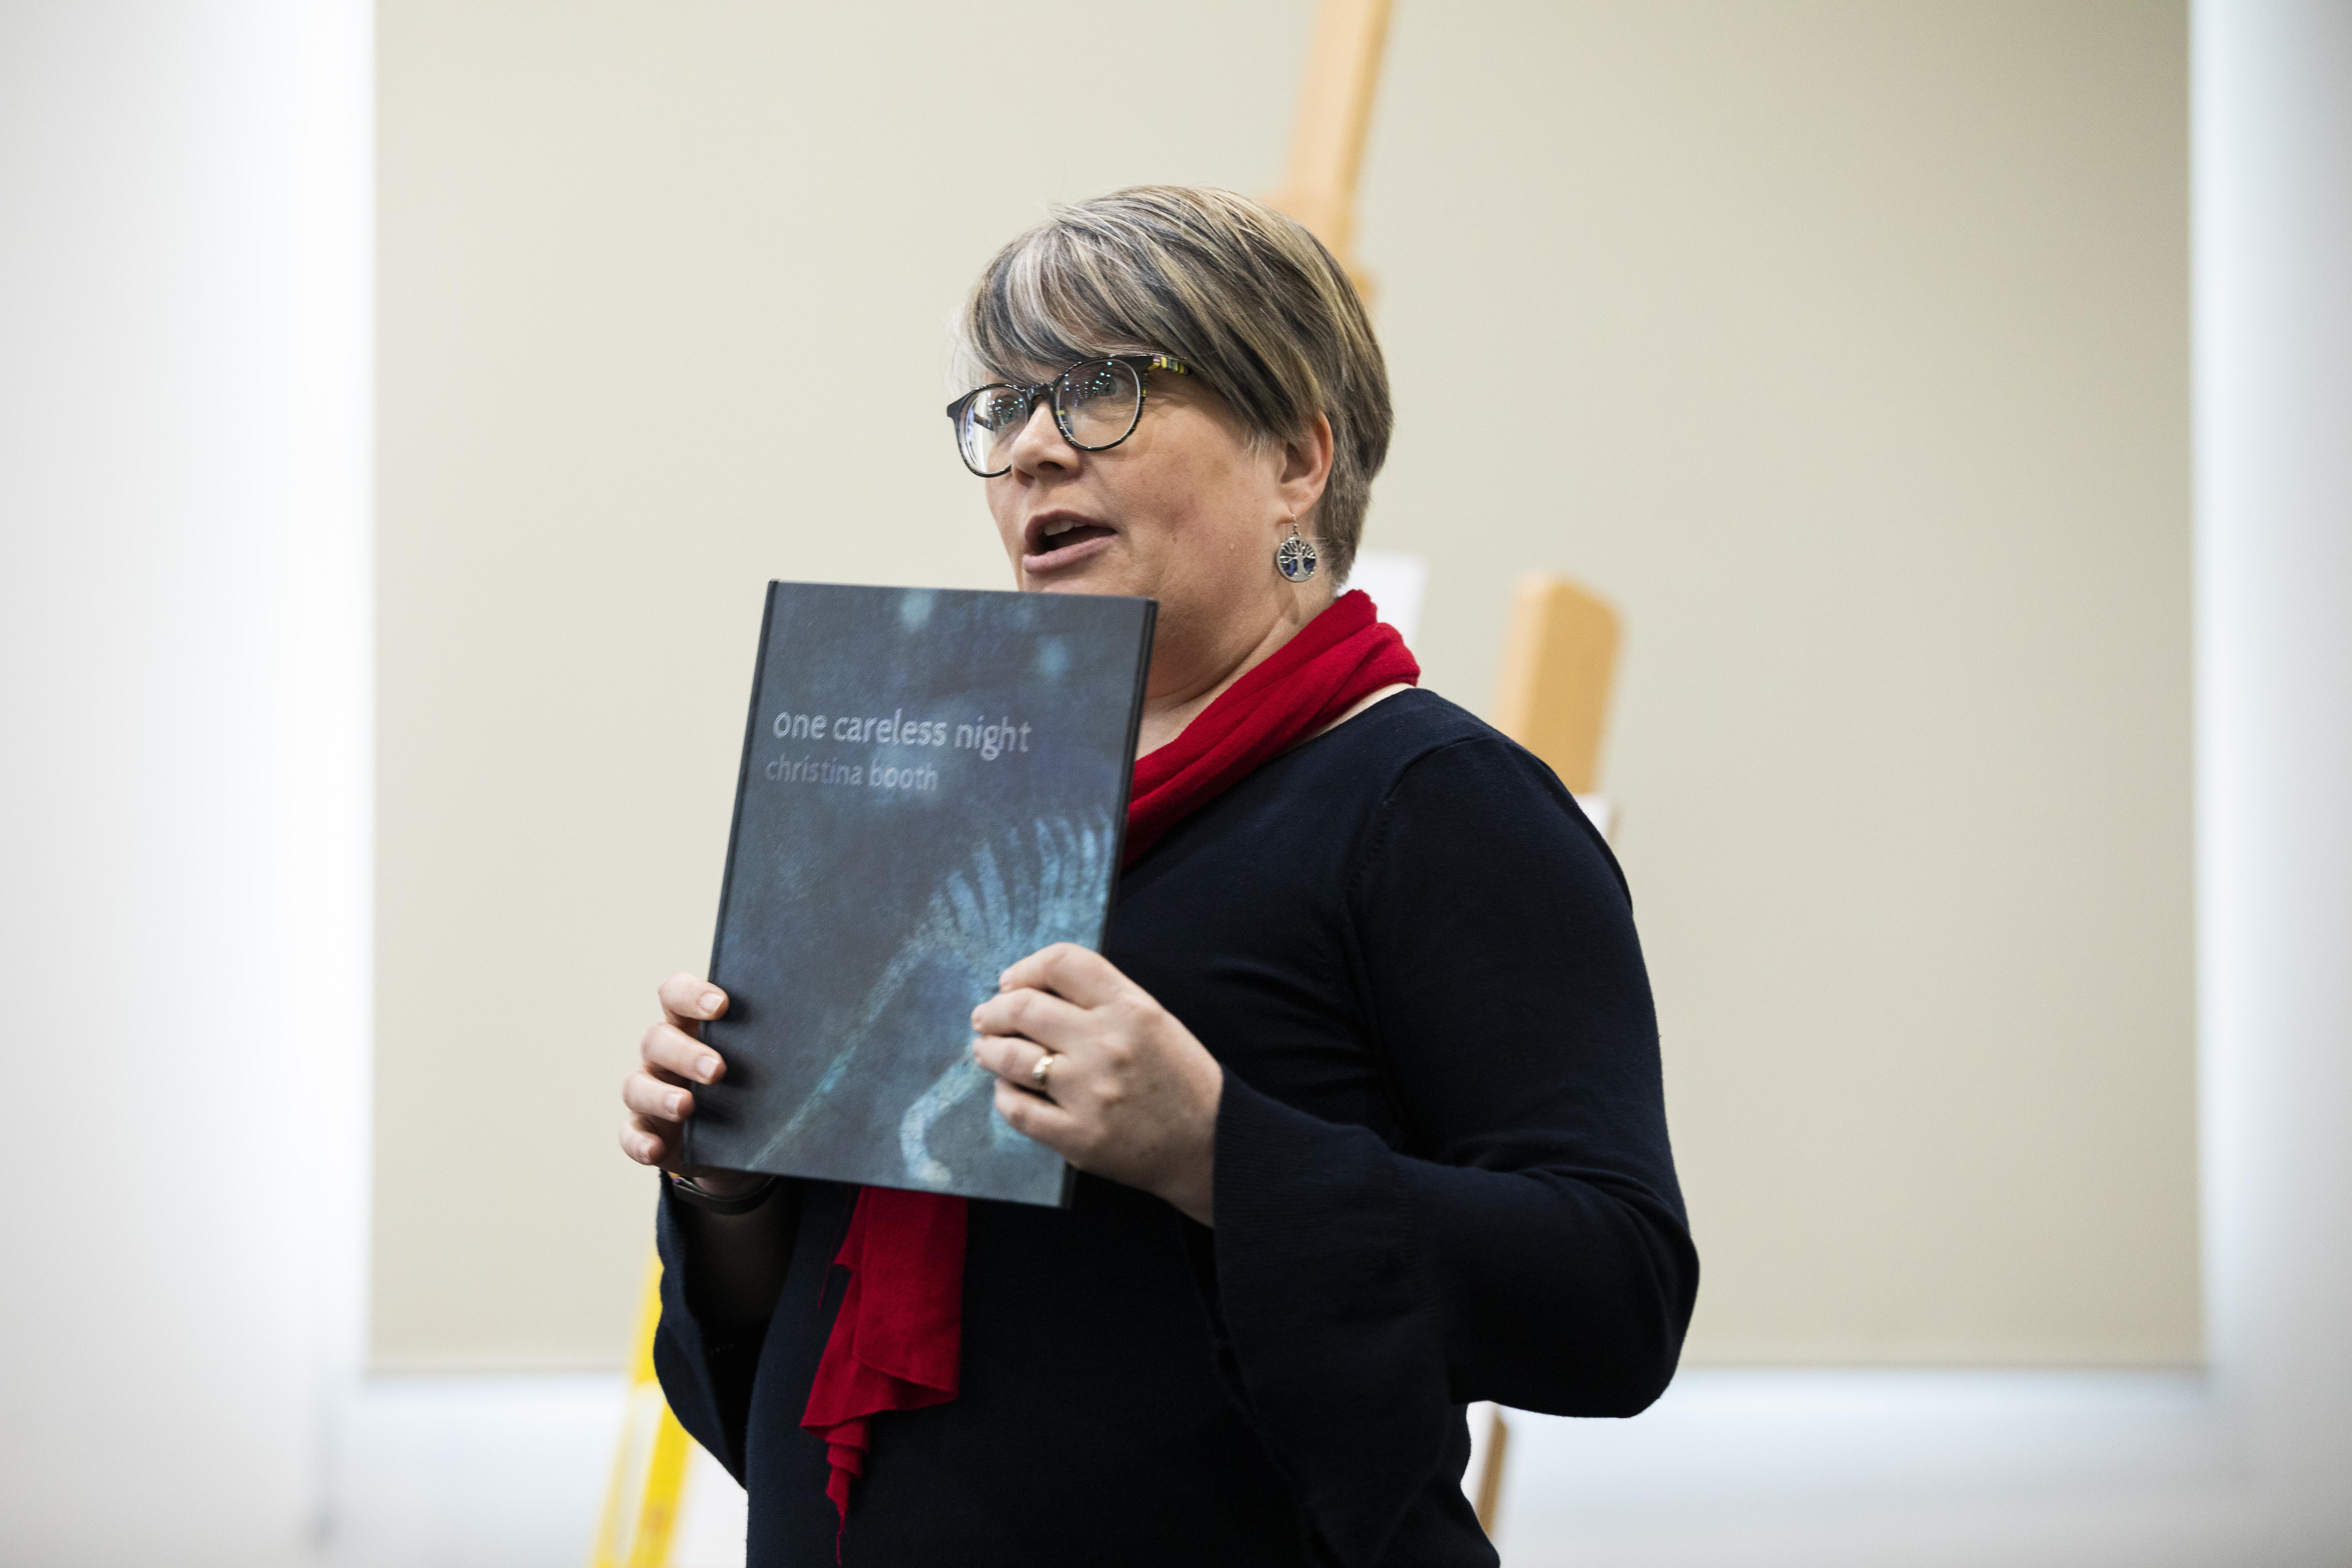 Children's author Christina Booth